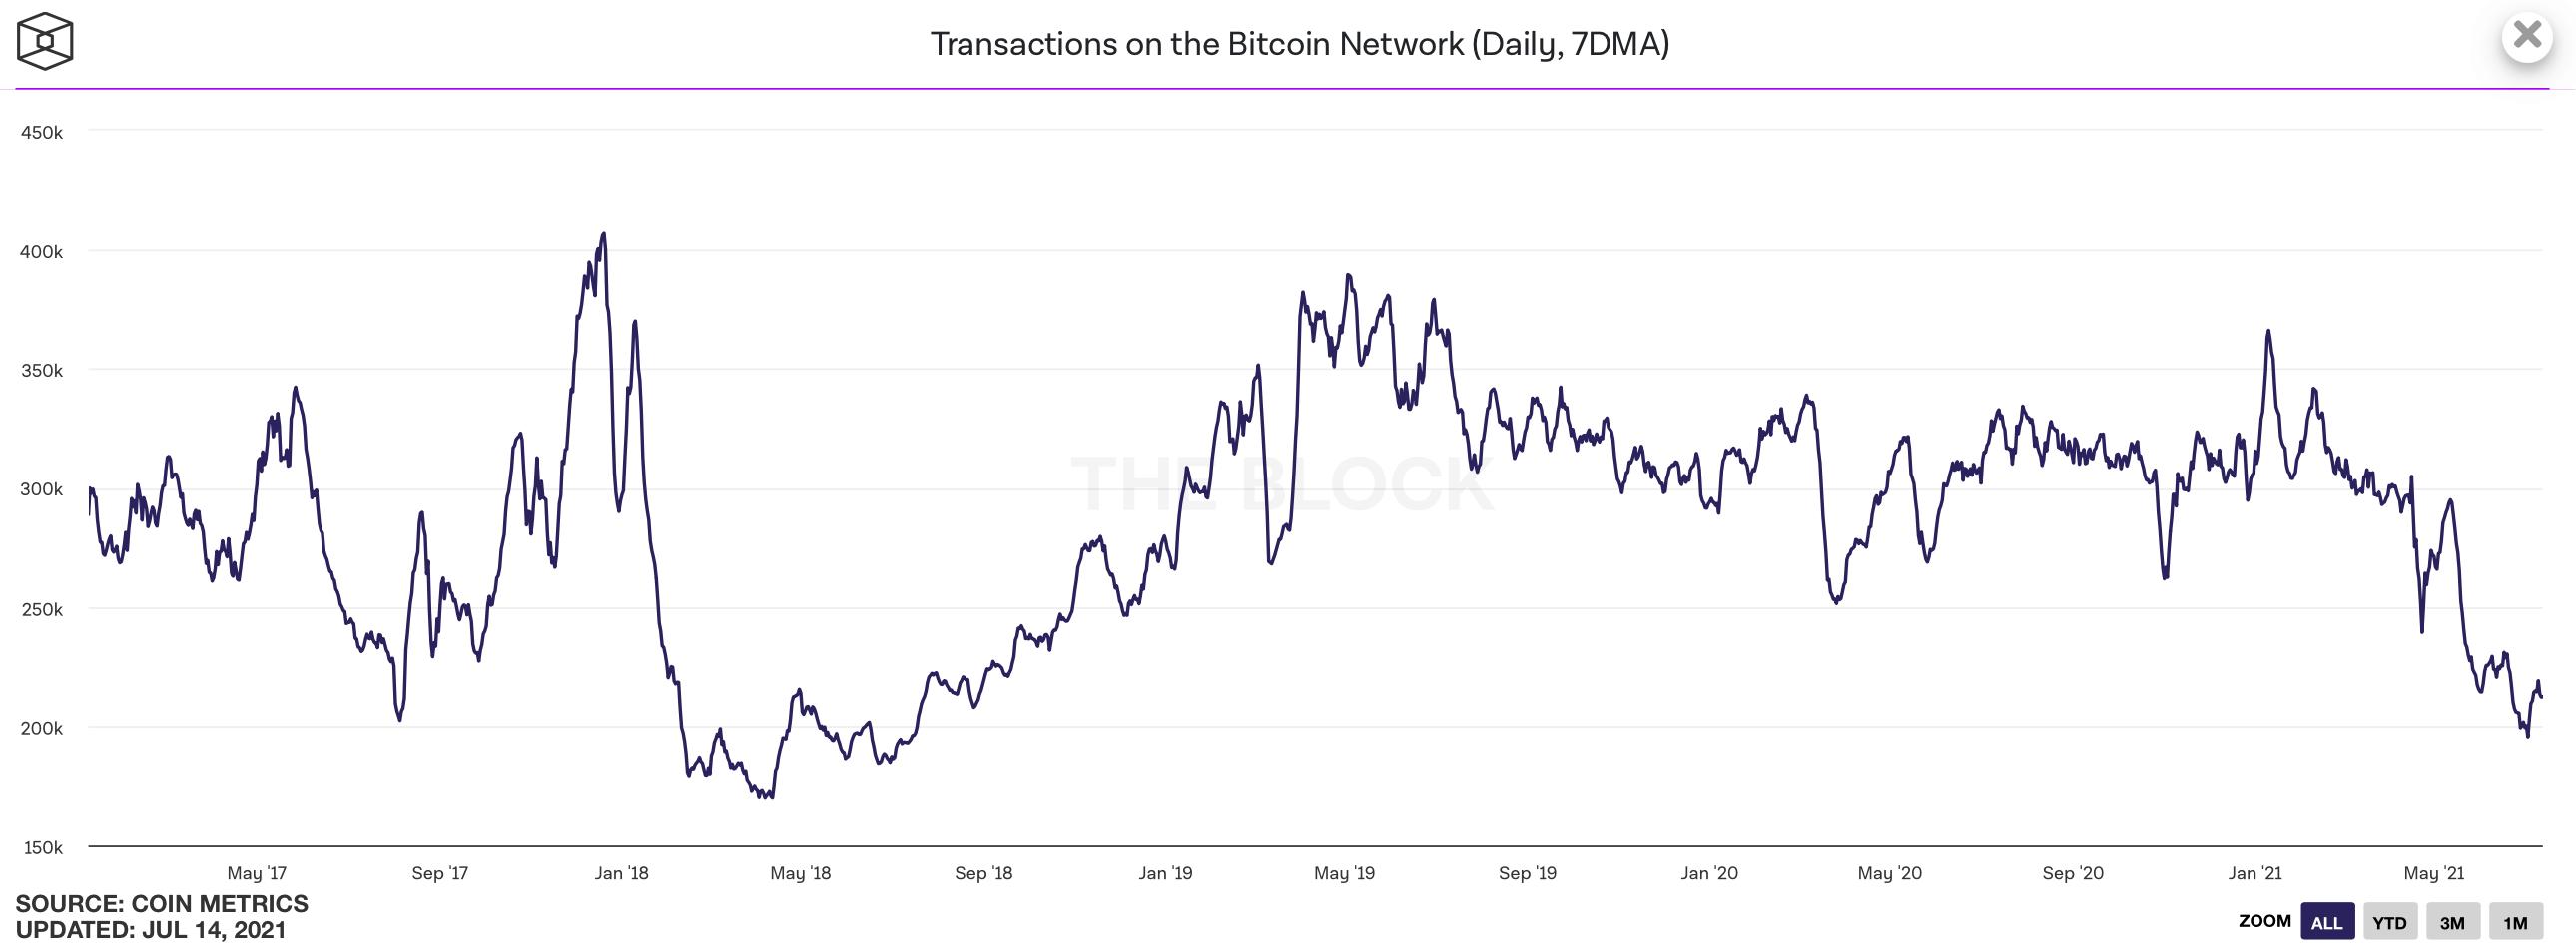 биткоин транзакции количество